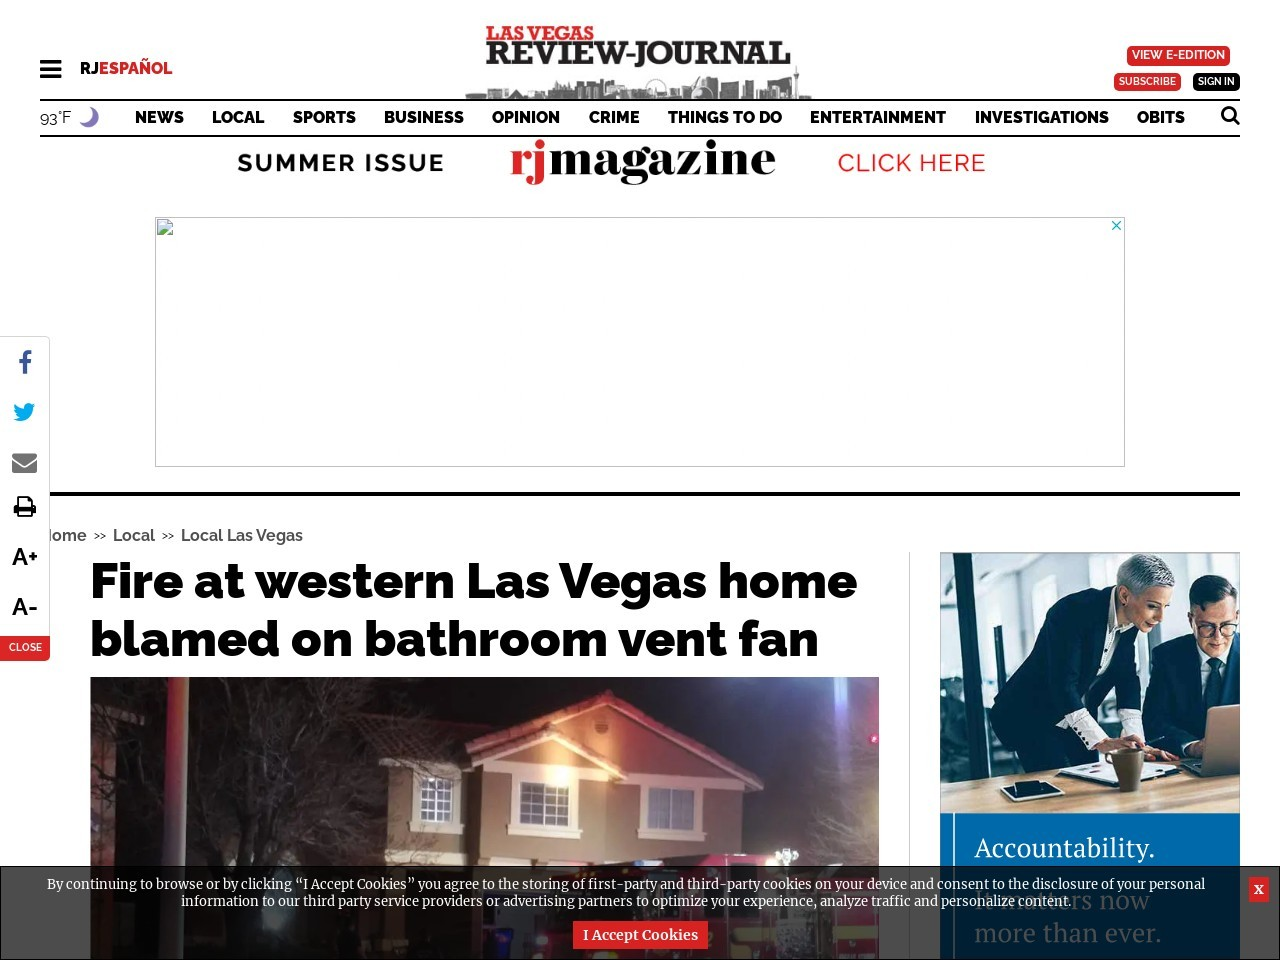 Fire at west Las Vegas home blamed on bathroom vent fan